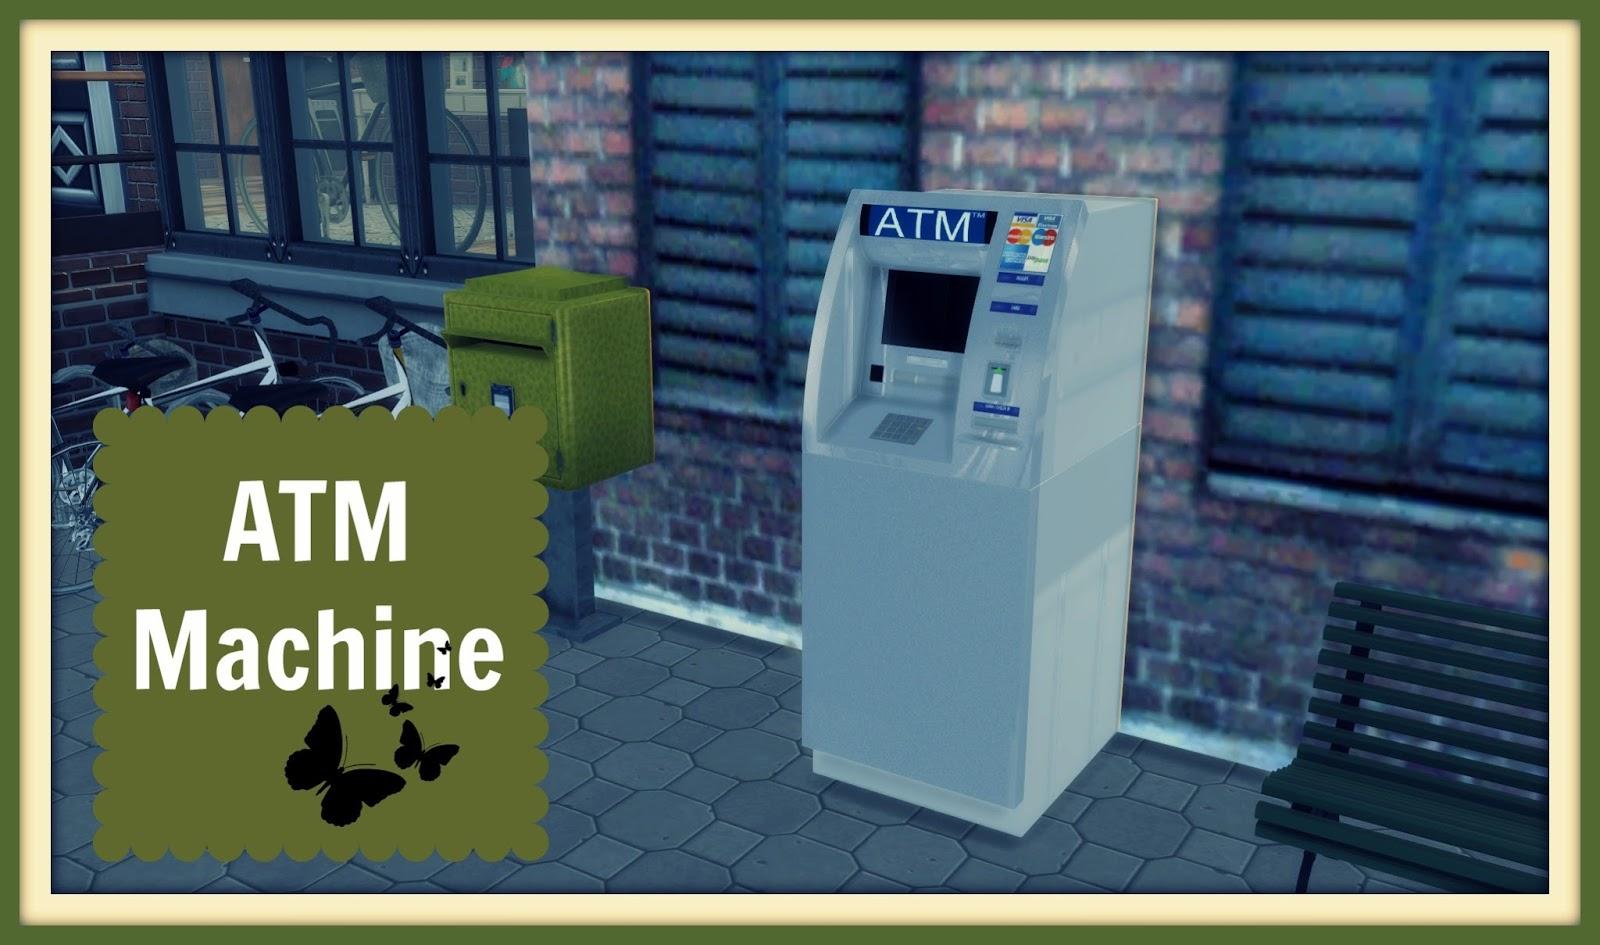 atm bank machine